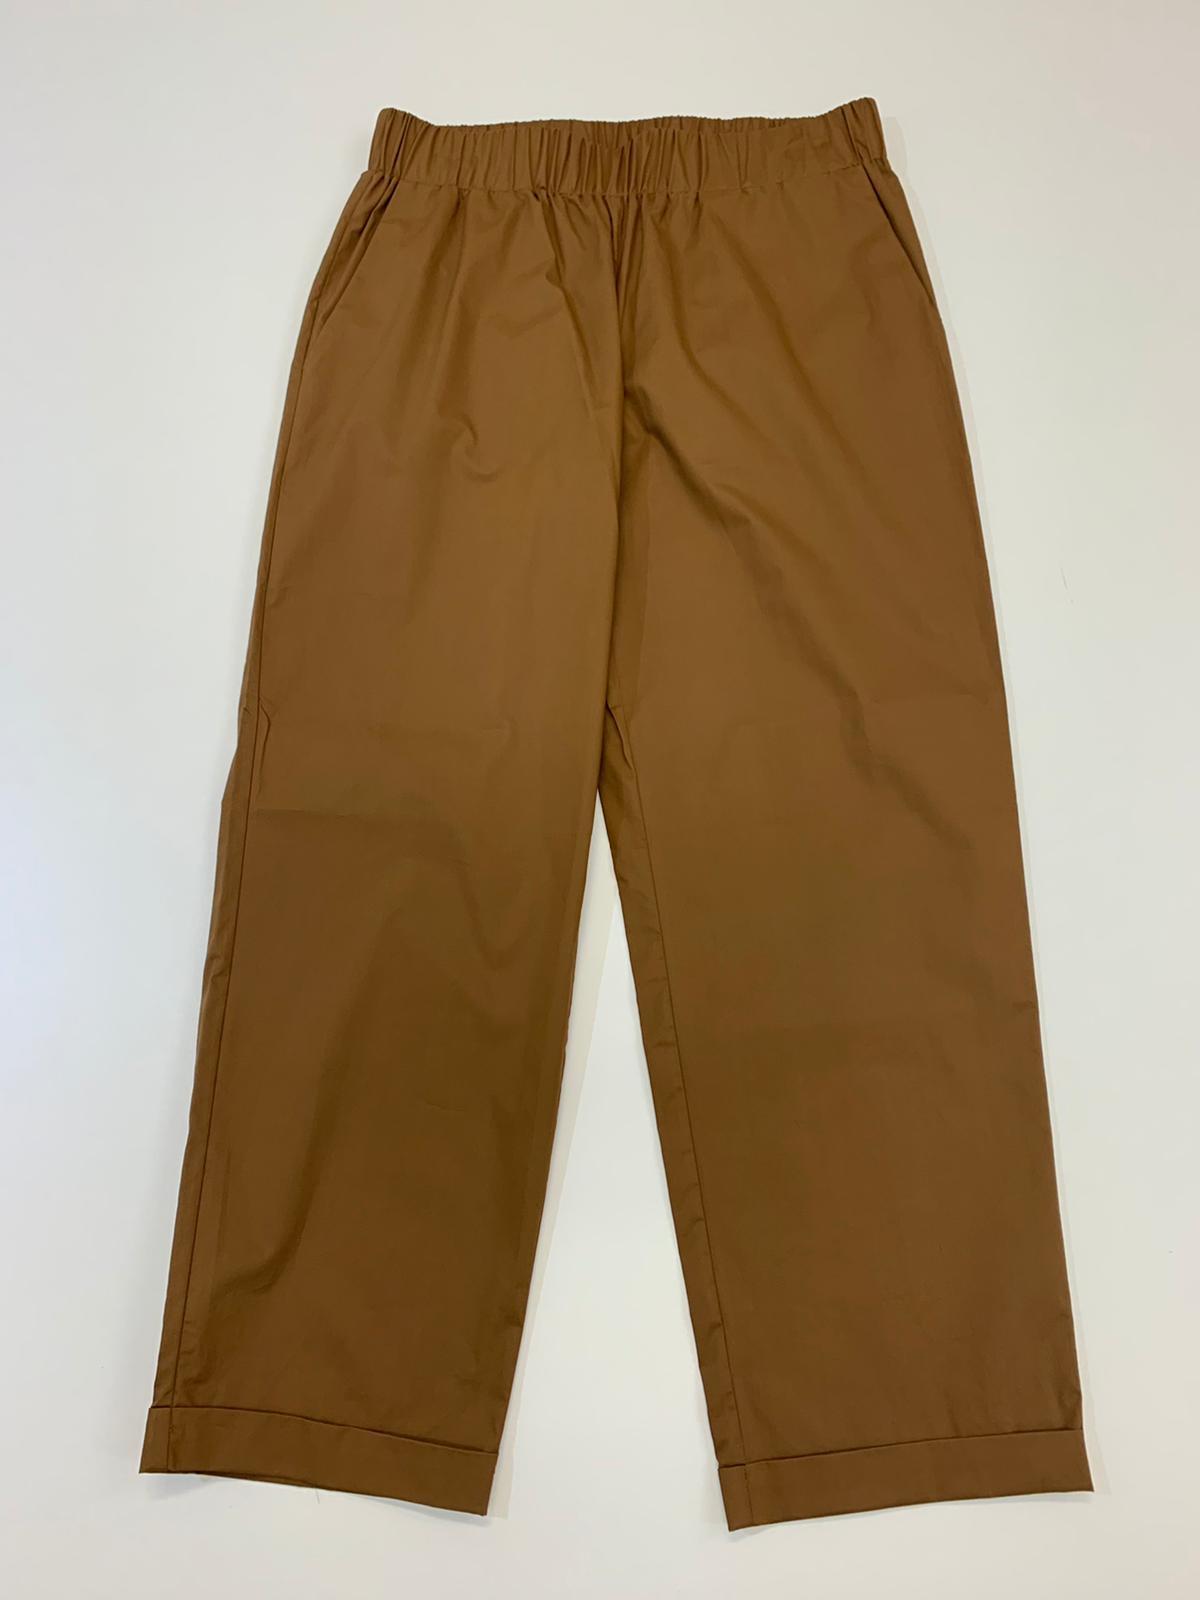 Pantalone Donna Seventy Tela Marrone